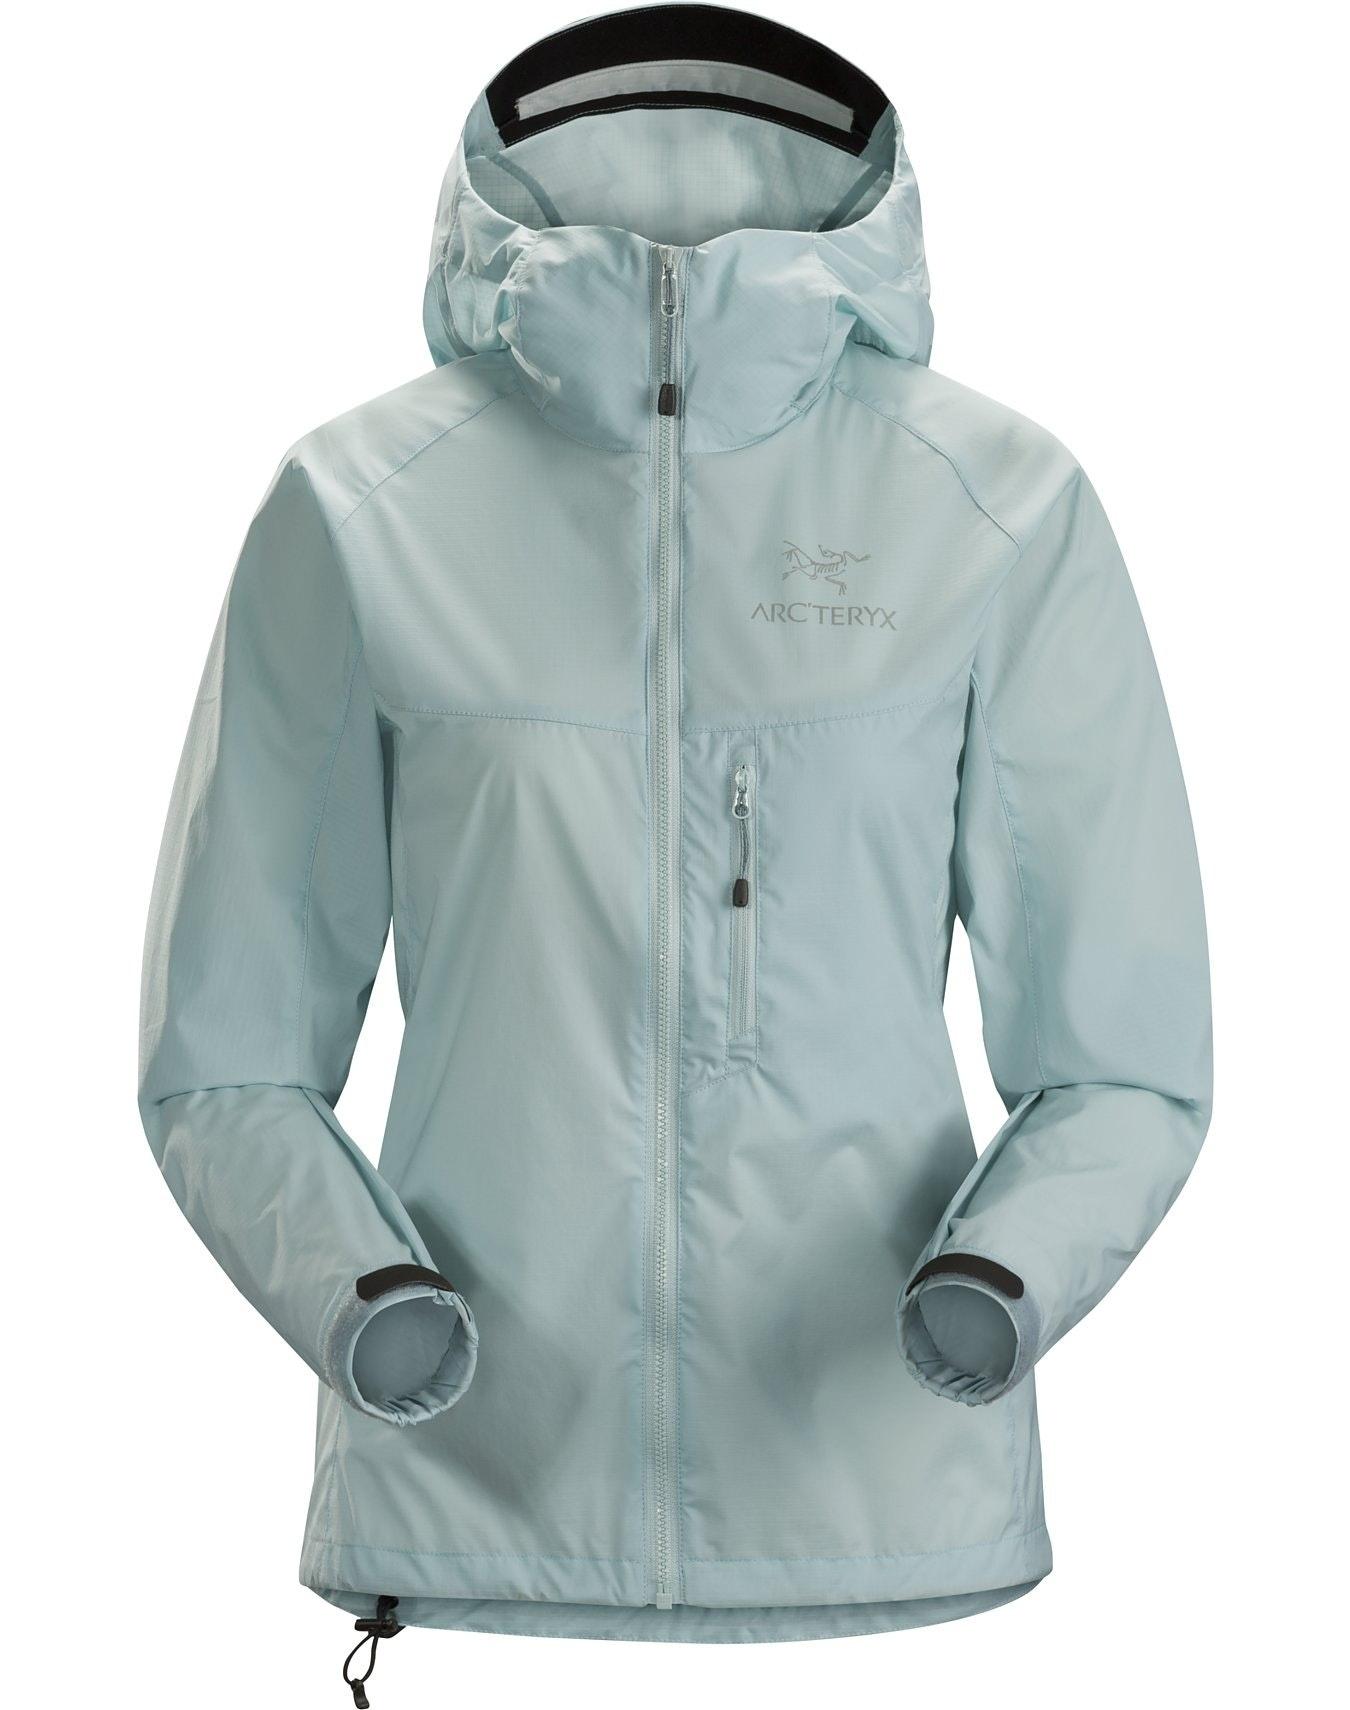 304c0426a30 Arc'teryx Squamish Hoody Women's - Ballahack Outdoor